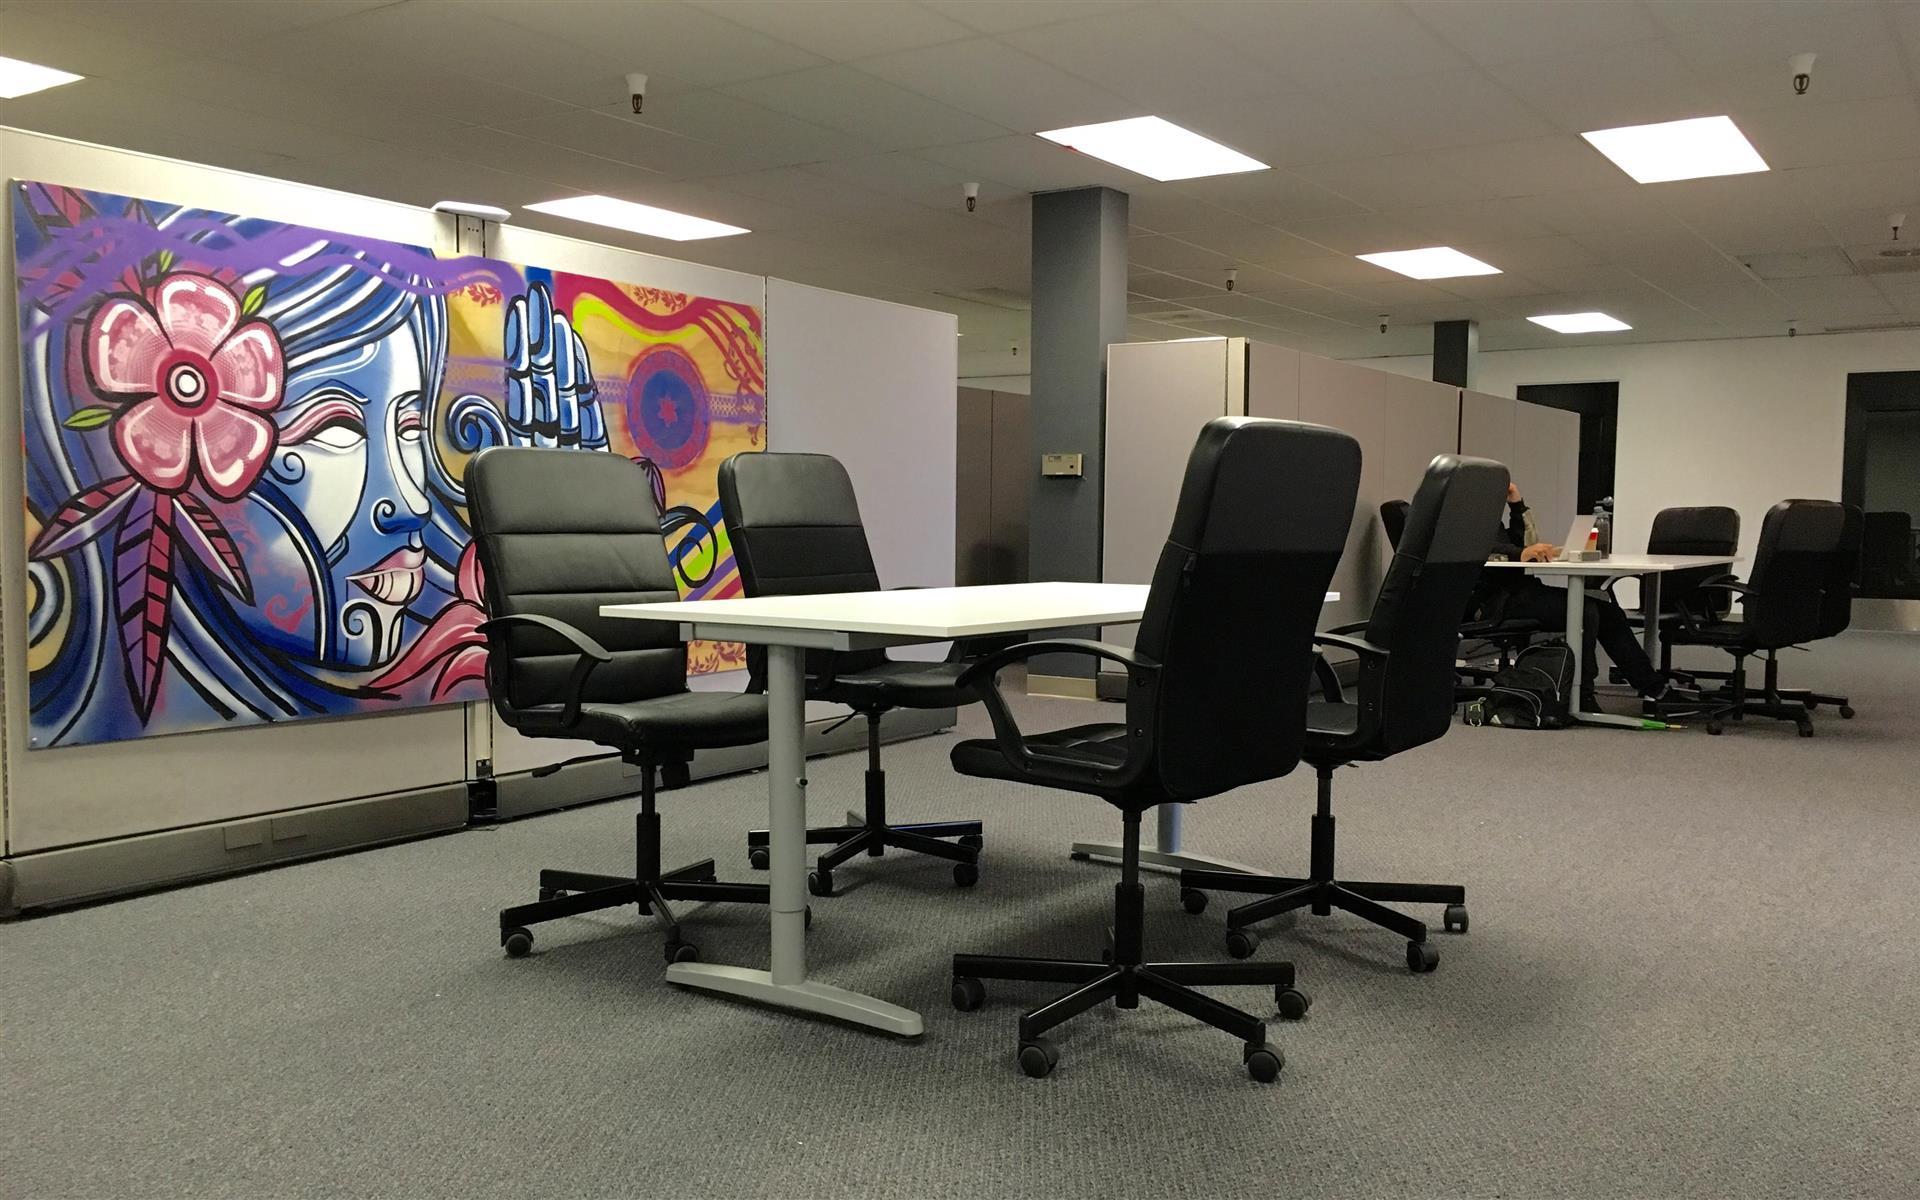 Mosaic Workspaces - Member